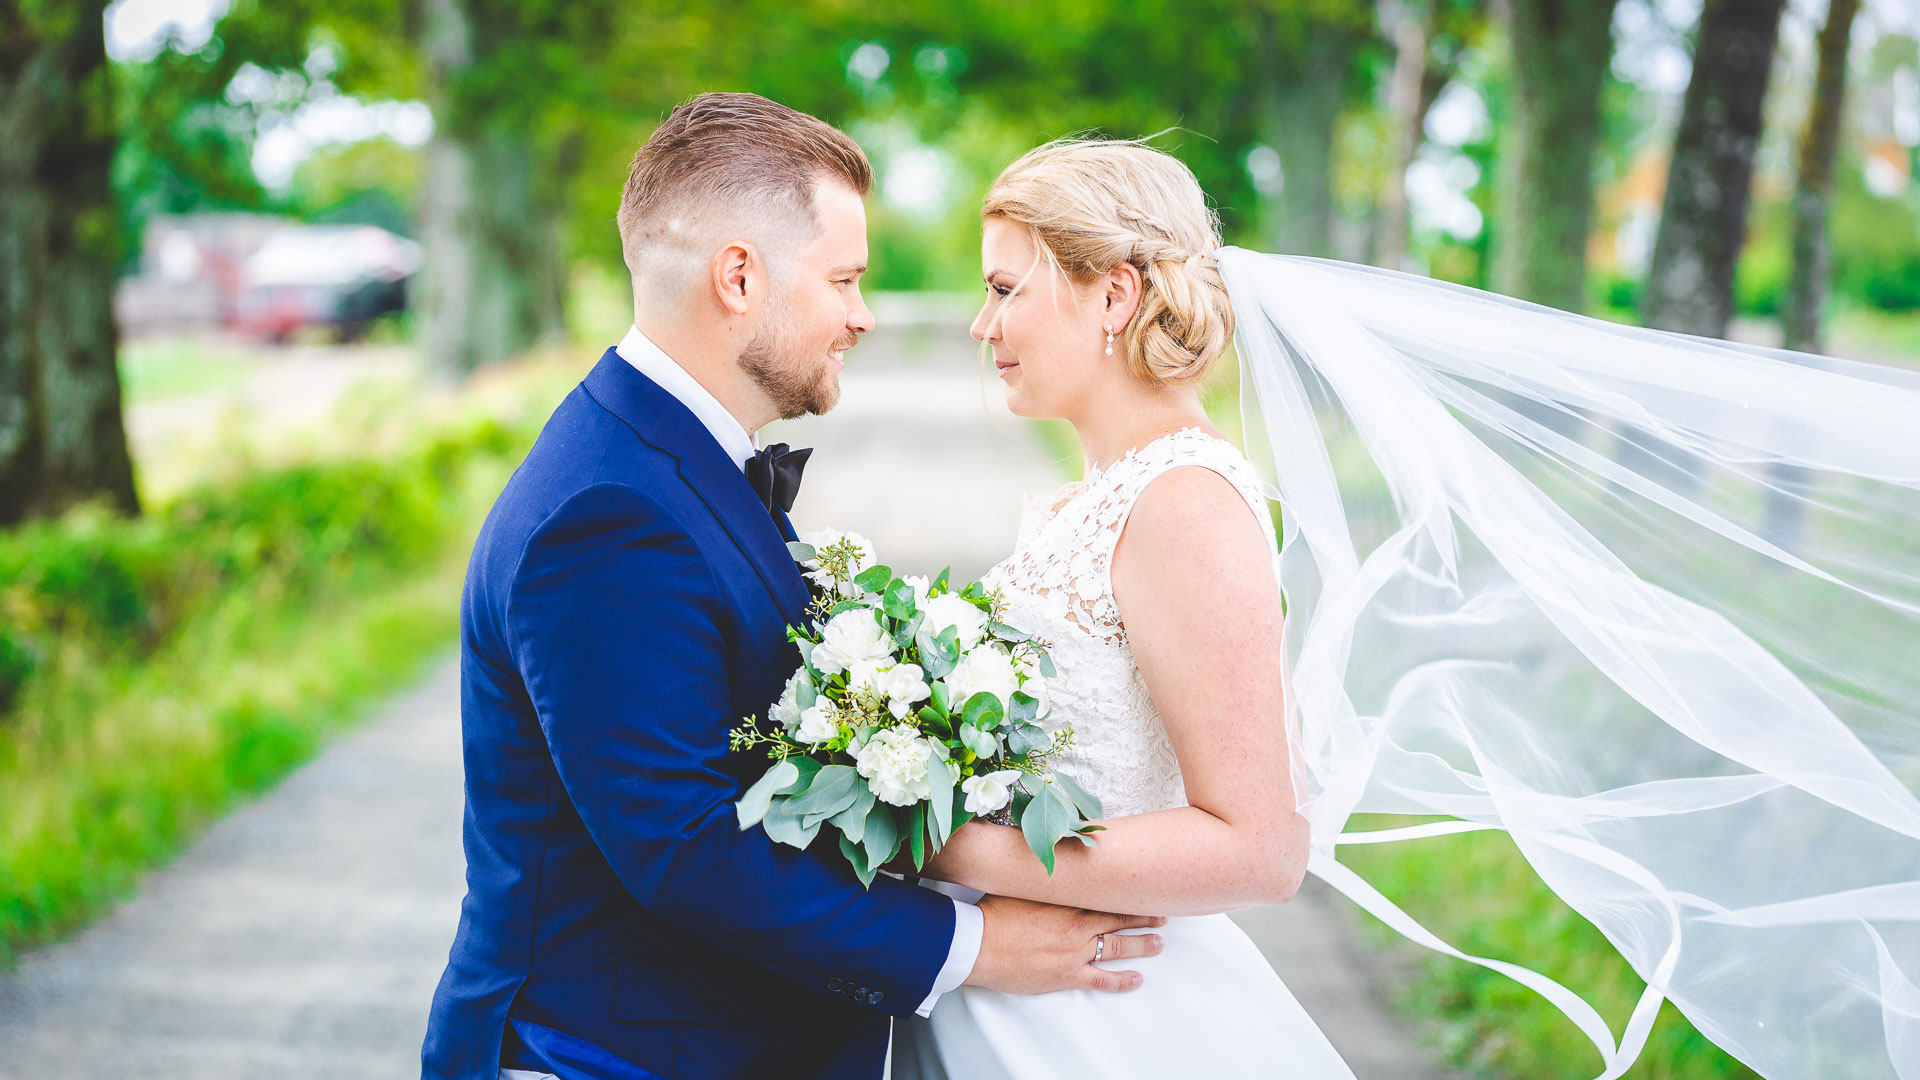 Bryllupsfotograf Brudeparet ser på hverandre